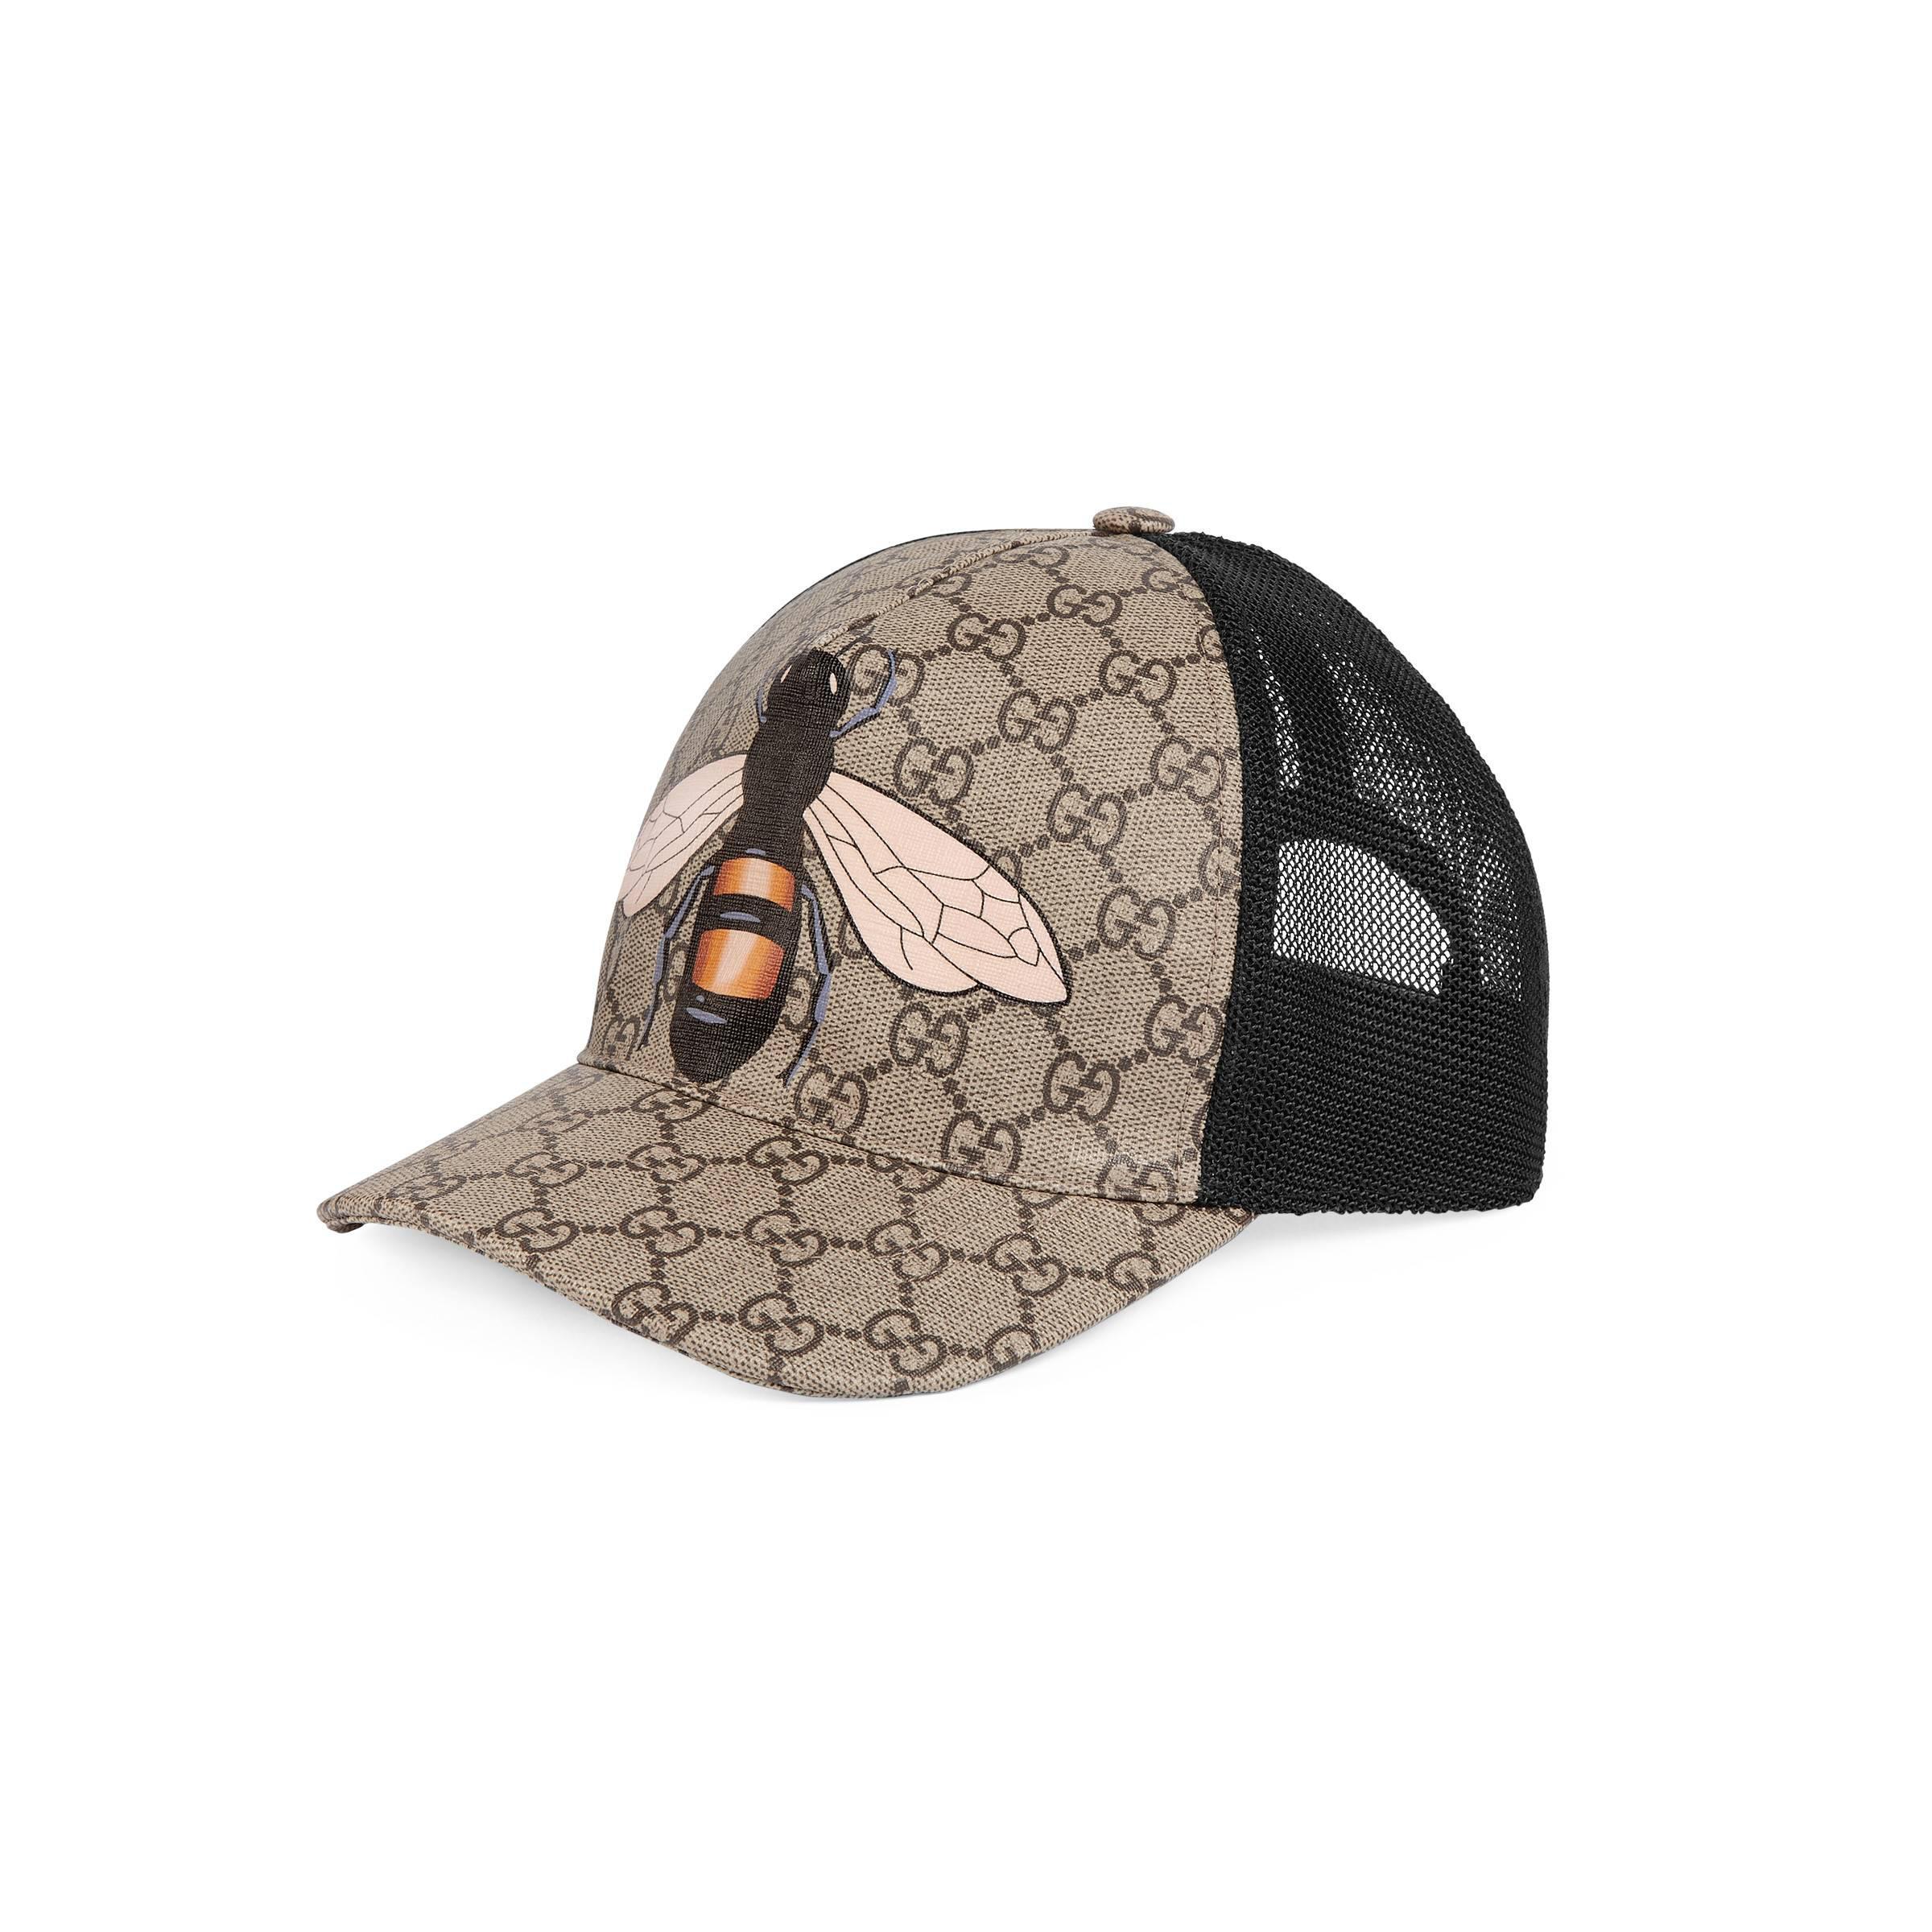 ea3b54146d Women's Natural Bee Print Gg Supreme Baseball Hat